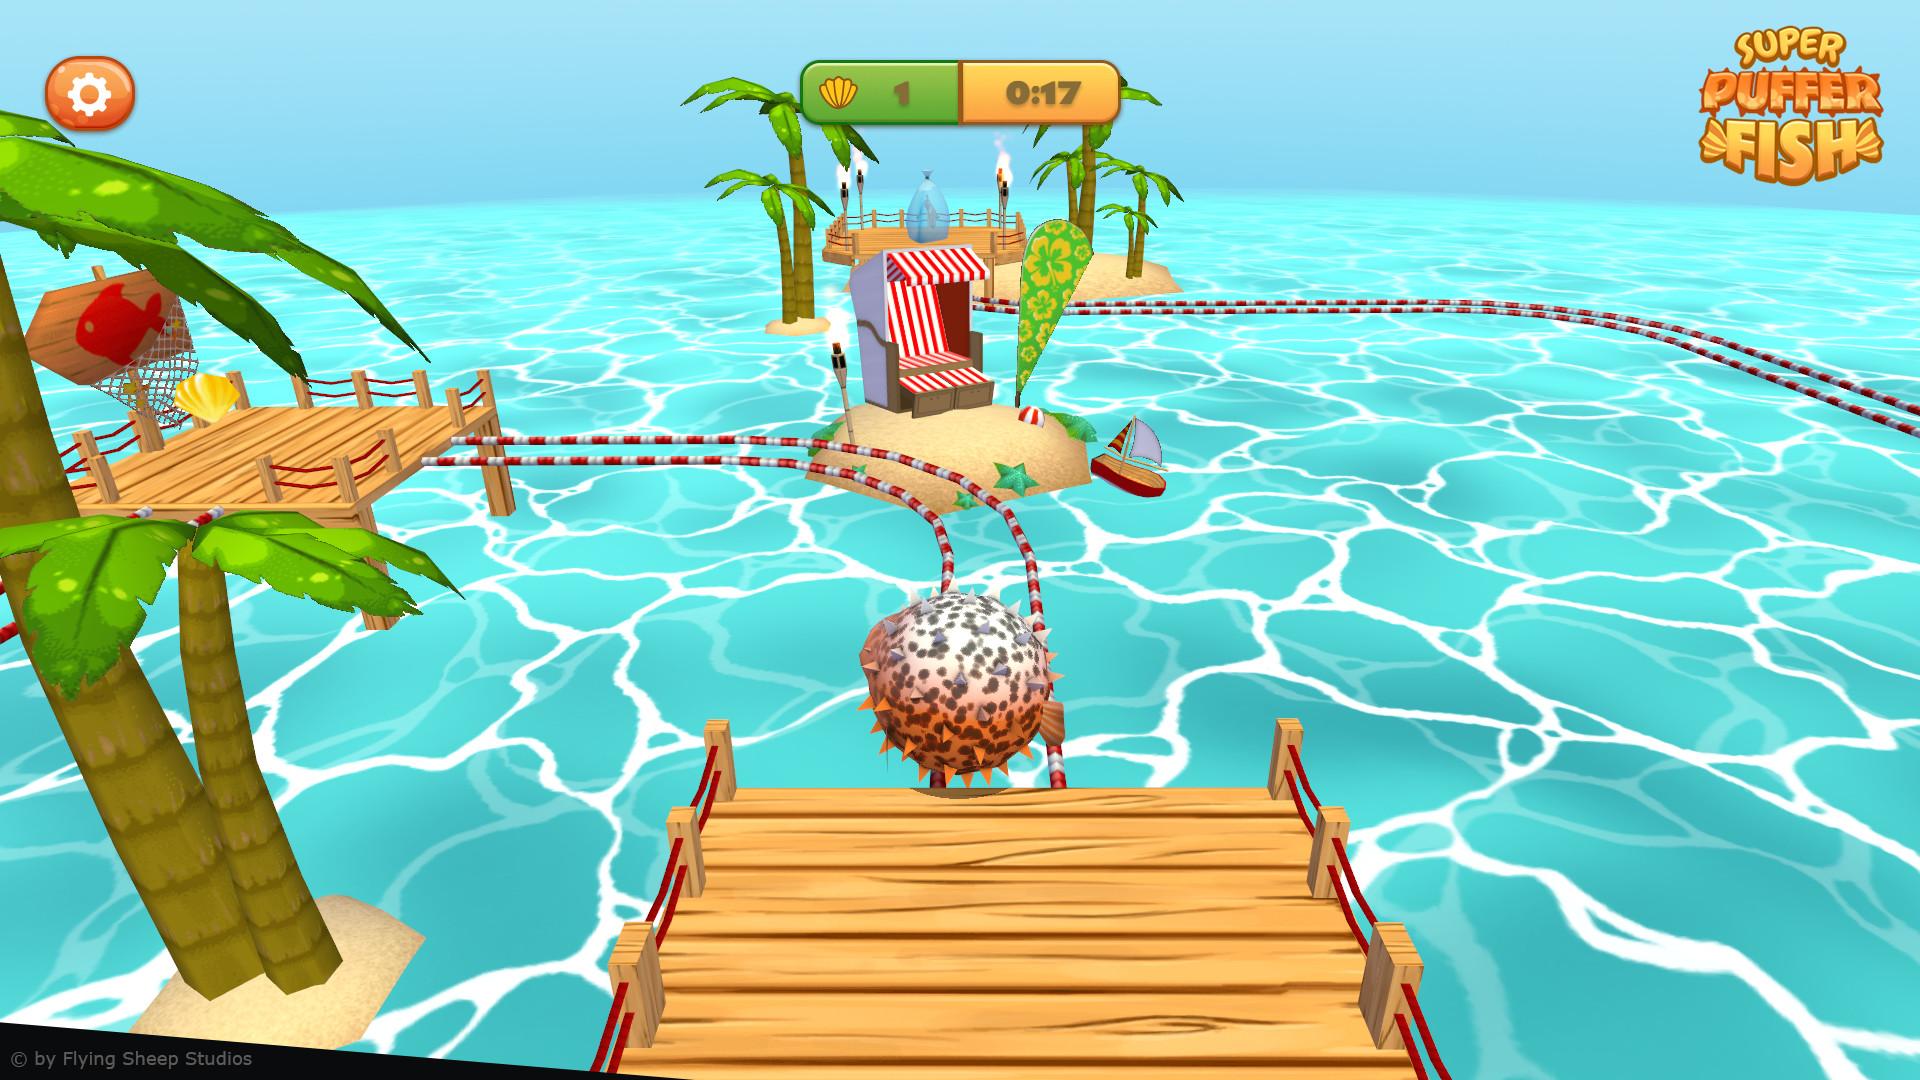 Marina hahn pufferfish screenshot